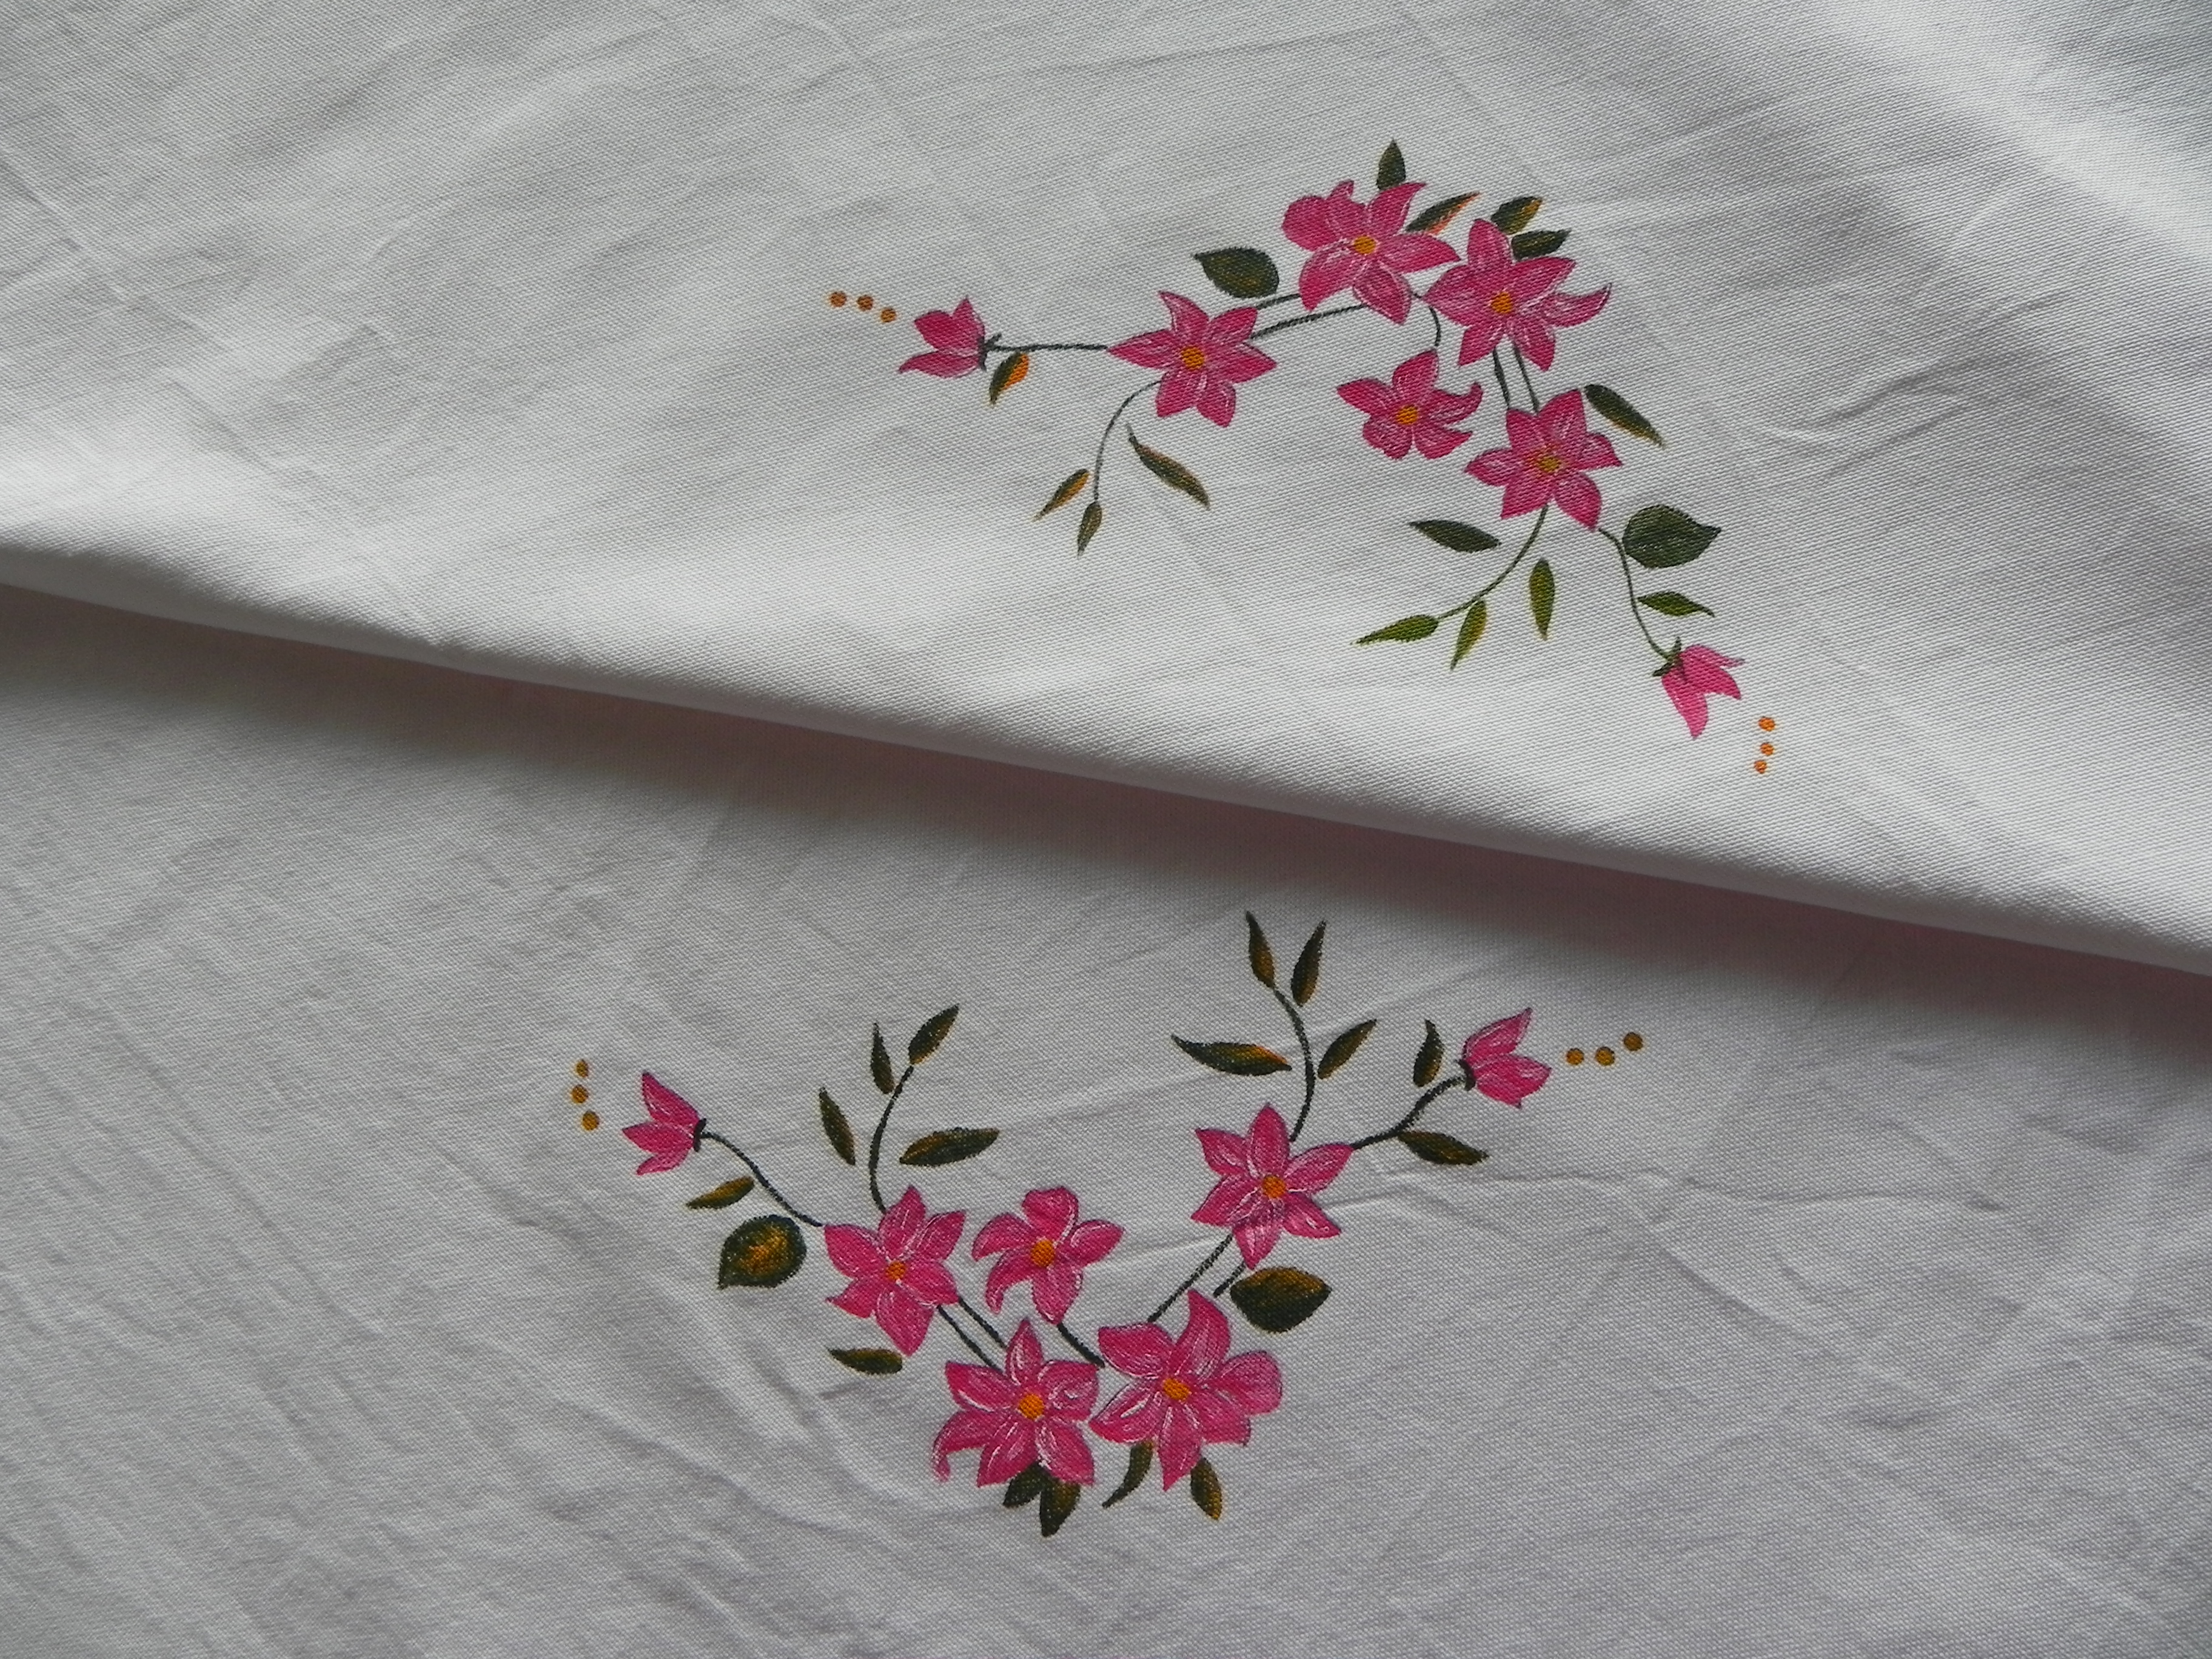 Pintura en tela otro mantel a painted tablecloth - Pintura en tela motivos navidenos ...